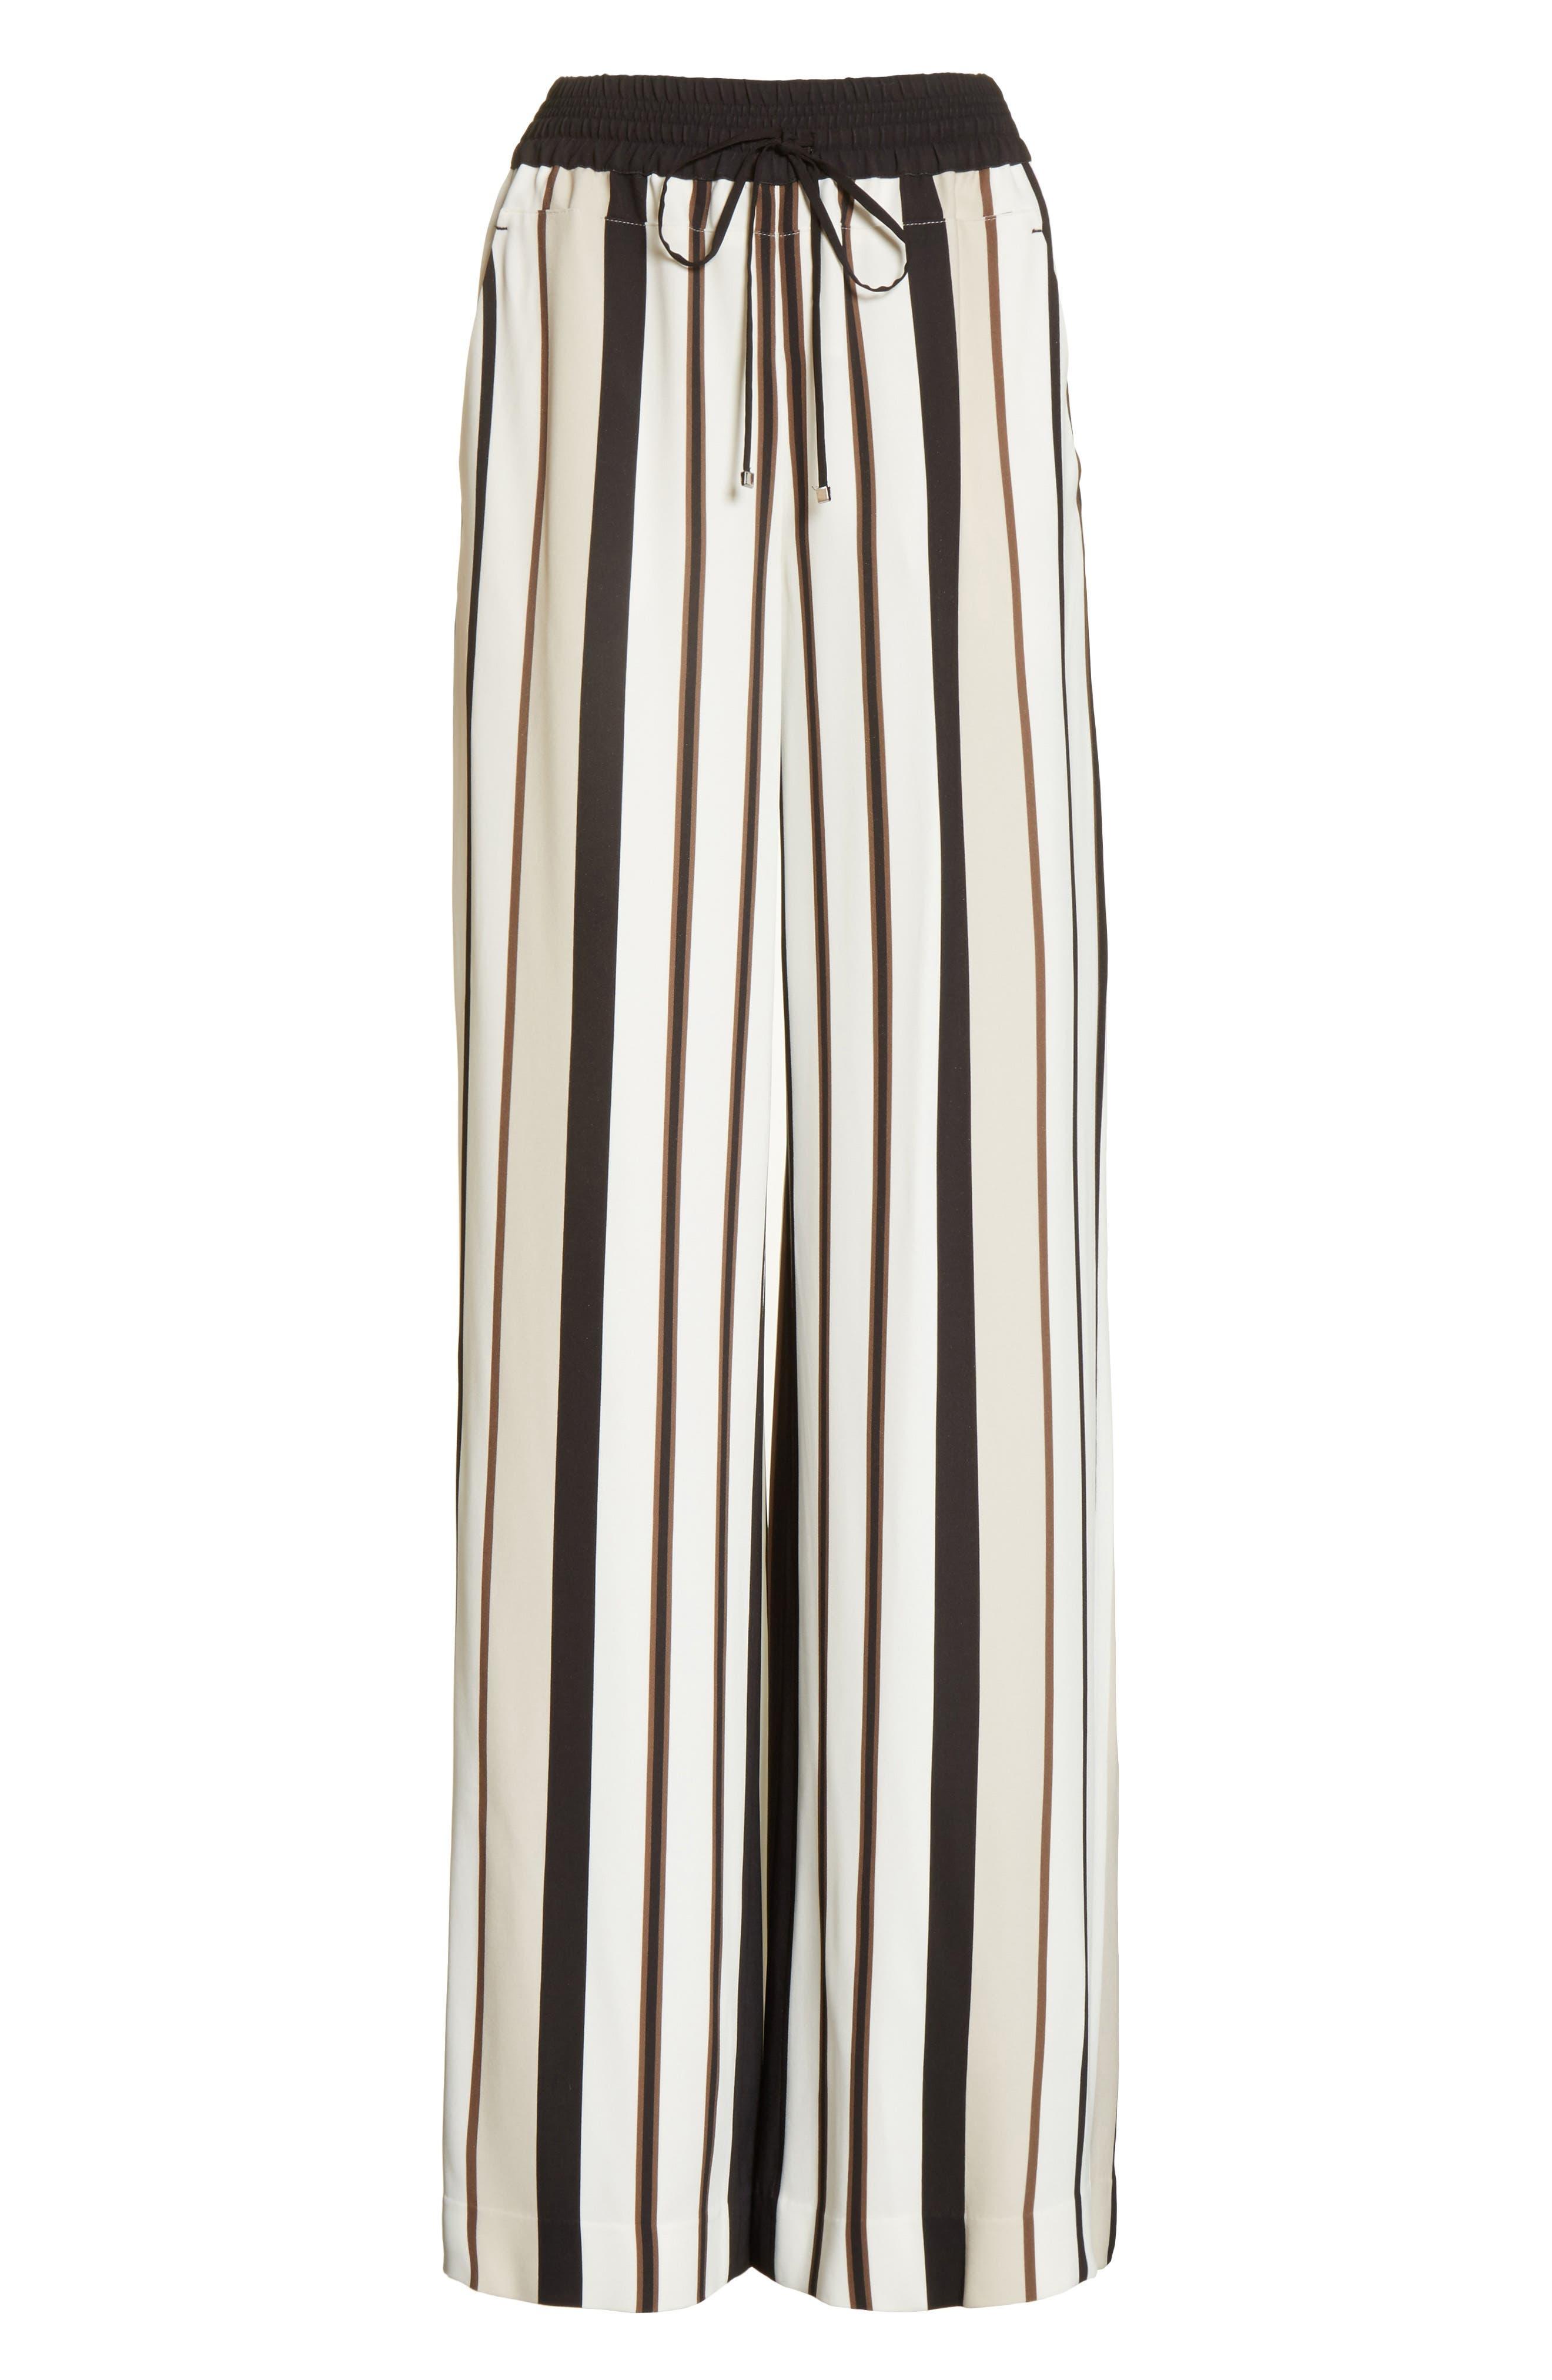 Allen Legacy Stripe Drape Cloth Pants,                             Alternate thumbnail 7, color,                             Black Multi